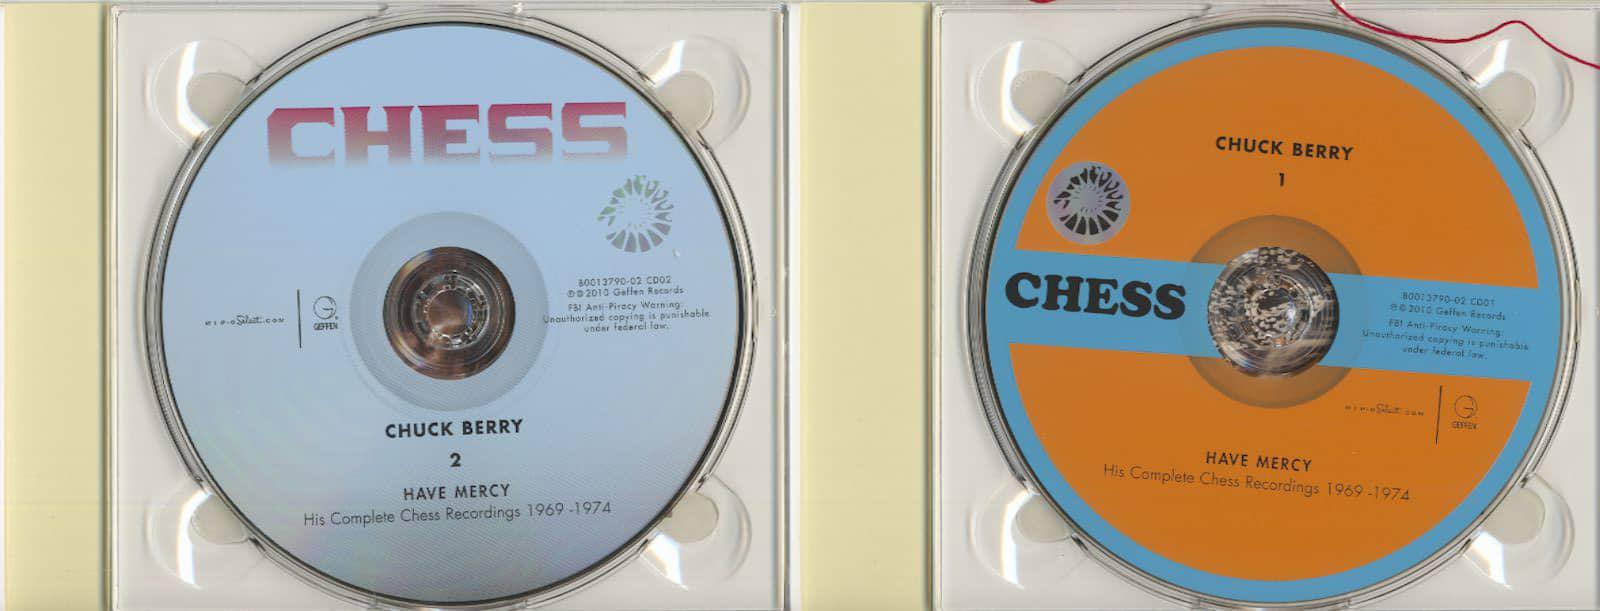 chuck berry cd have mercy complete chess 1969 74 4 cd bear rh bear family com